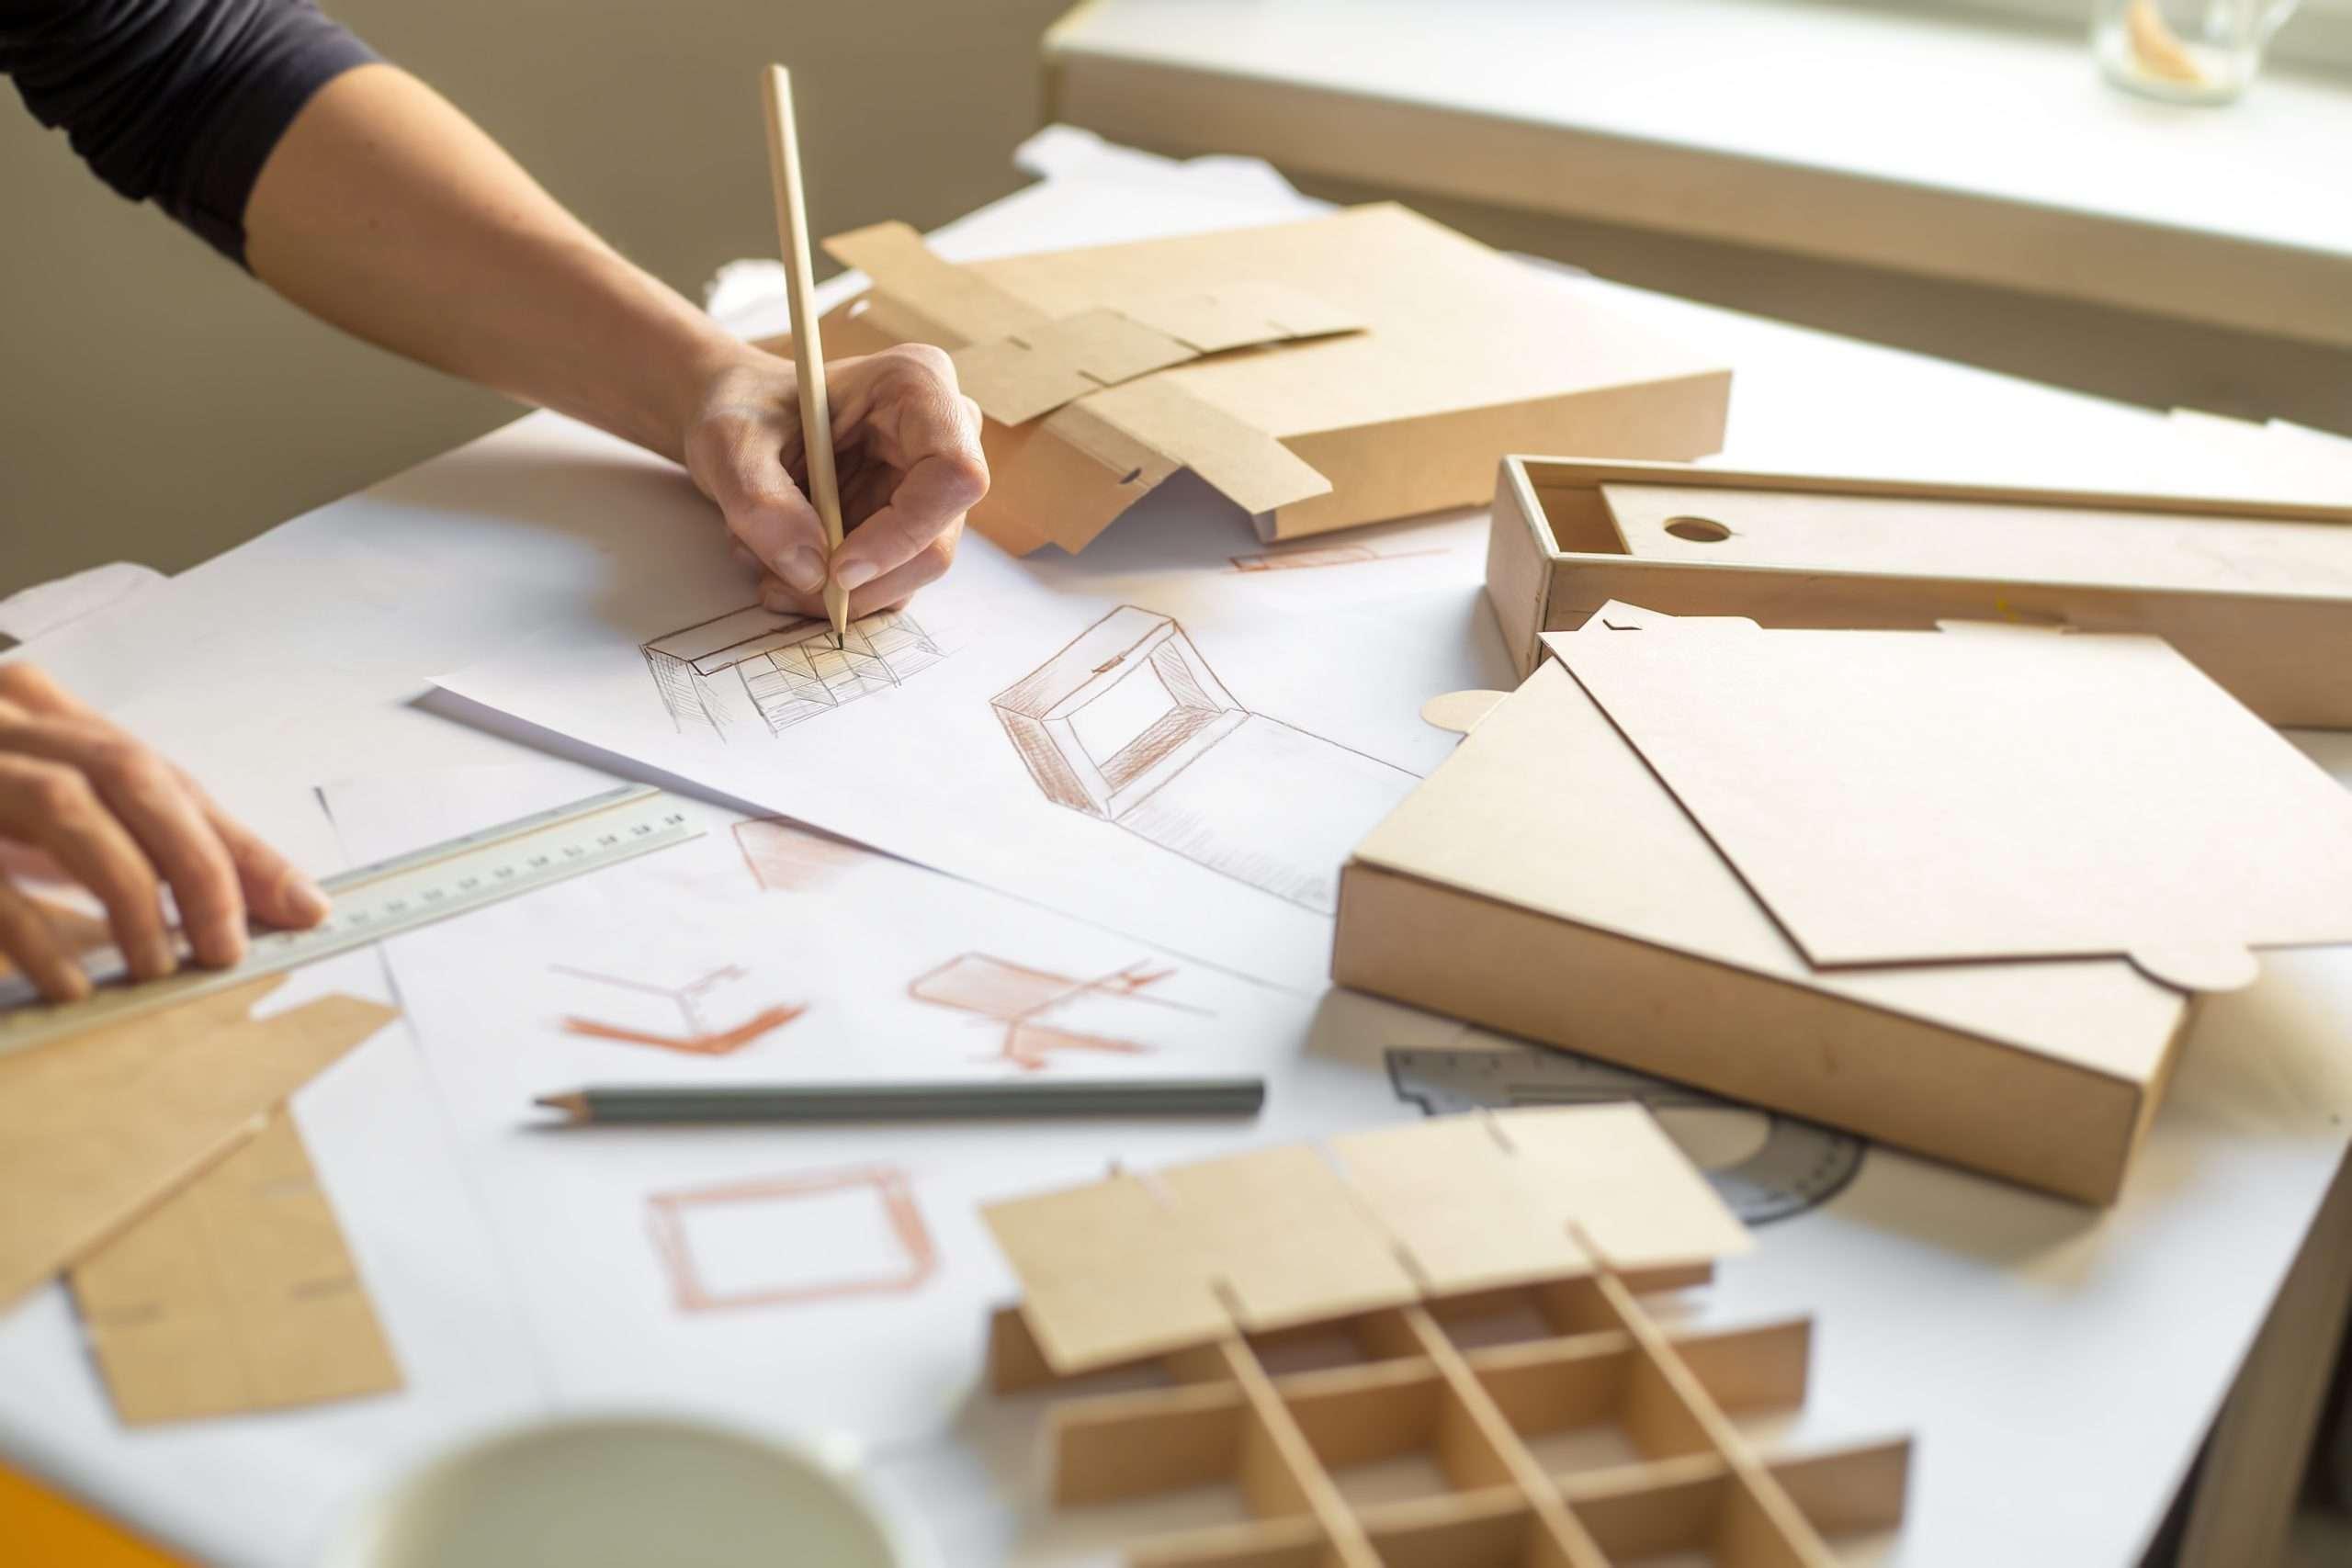 etiquete and packaging design seminar Σεμινάριο Συσκευασίας Packaging | Σχεδιασμός Ετικέτας & Folder